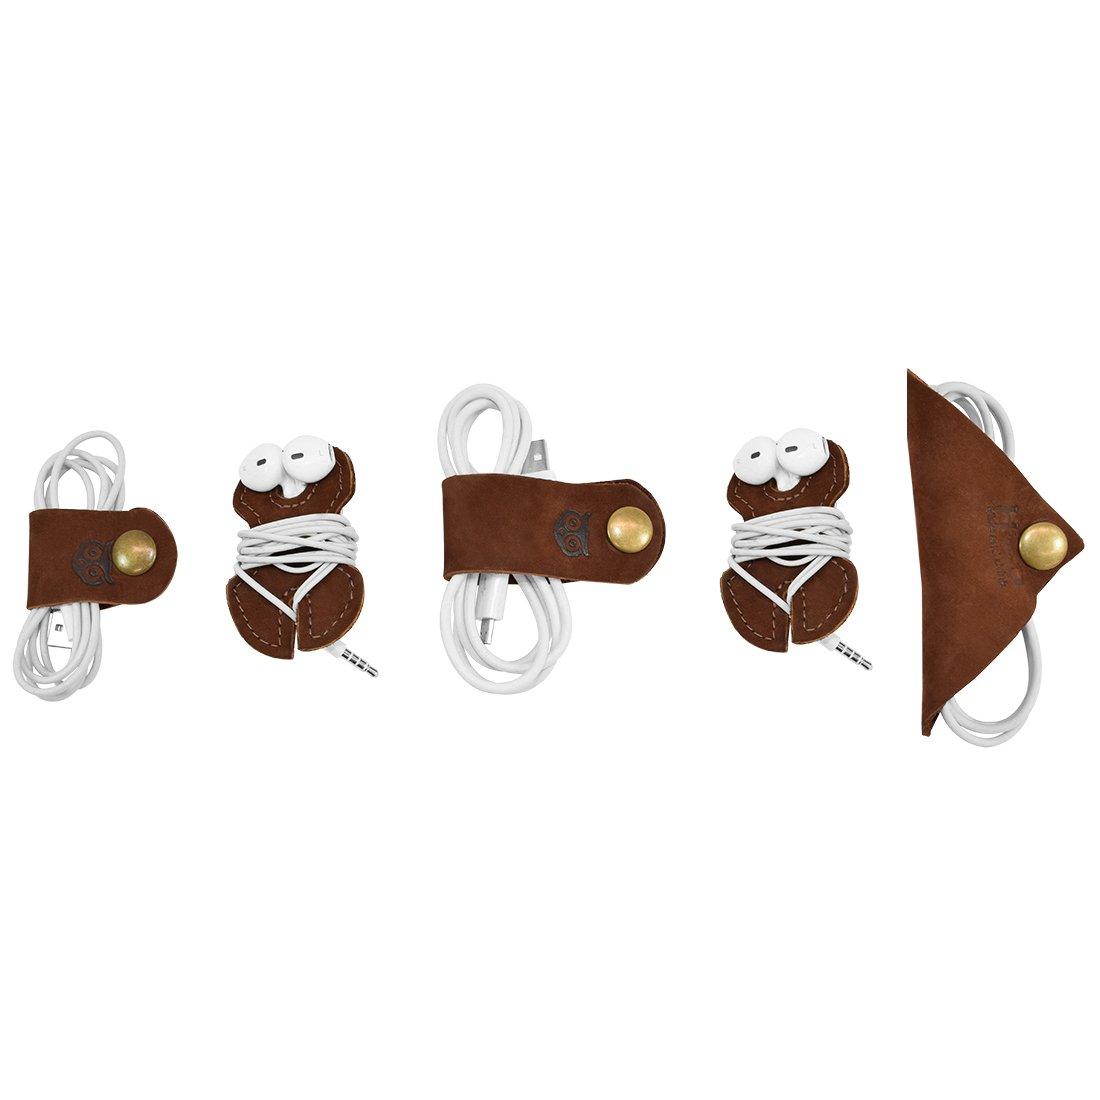 Cord Keeper (Cord Clam) 5-Pack Handmade by Hide & Drink :: Swayze Suede